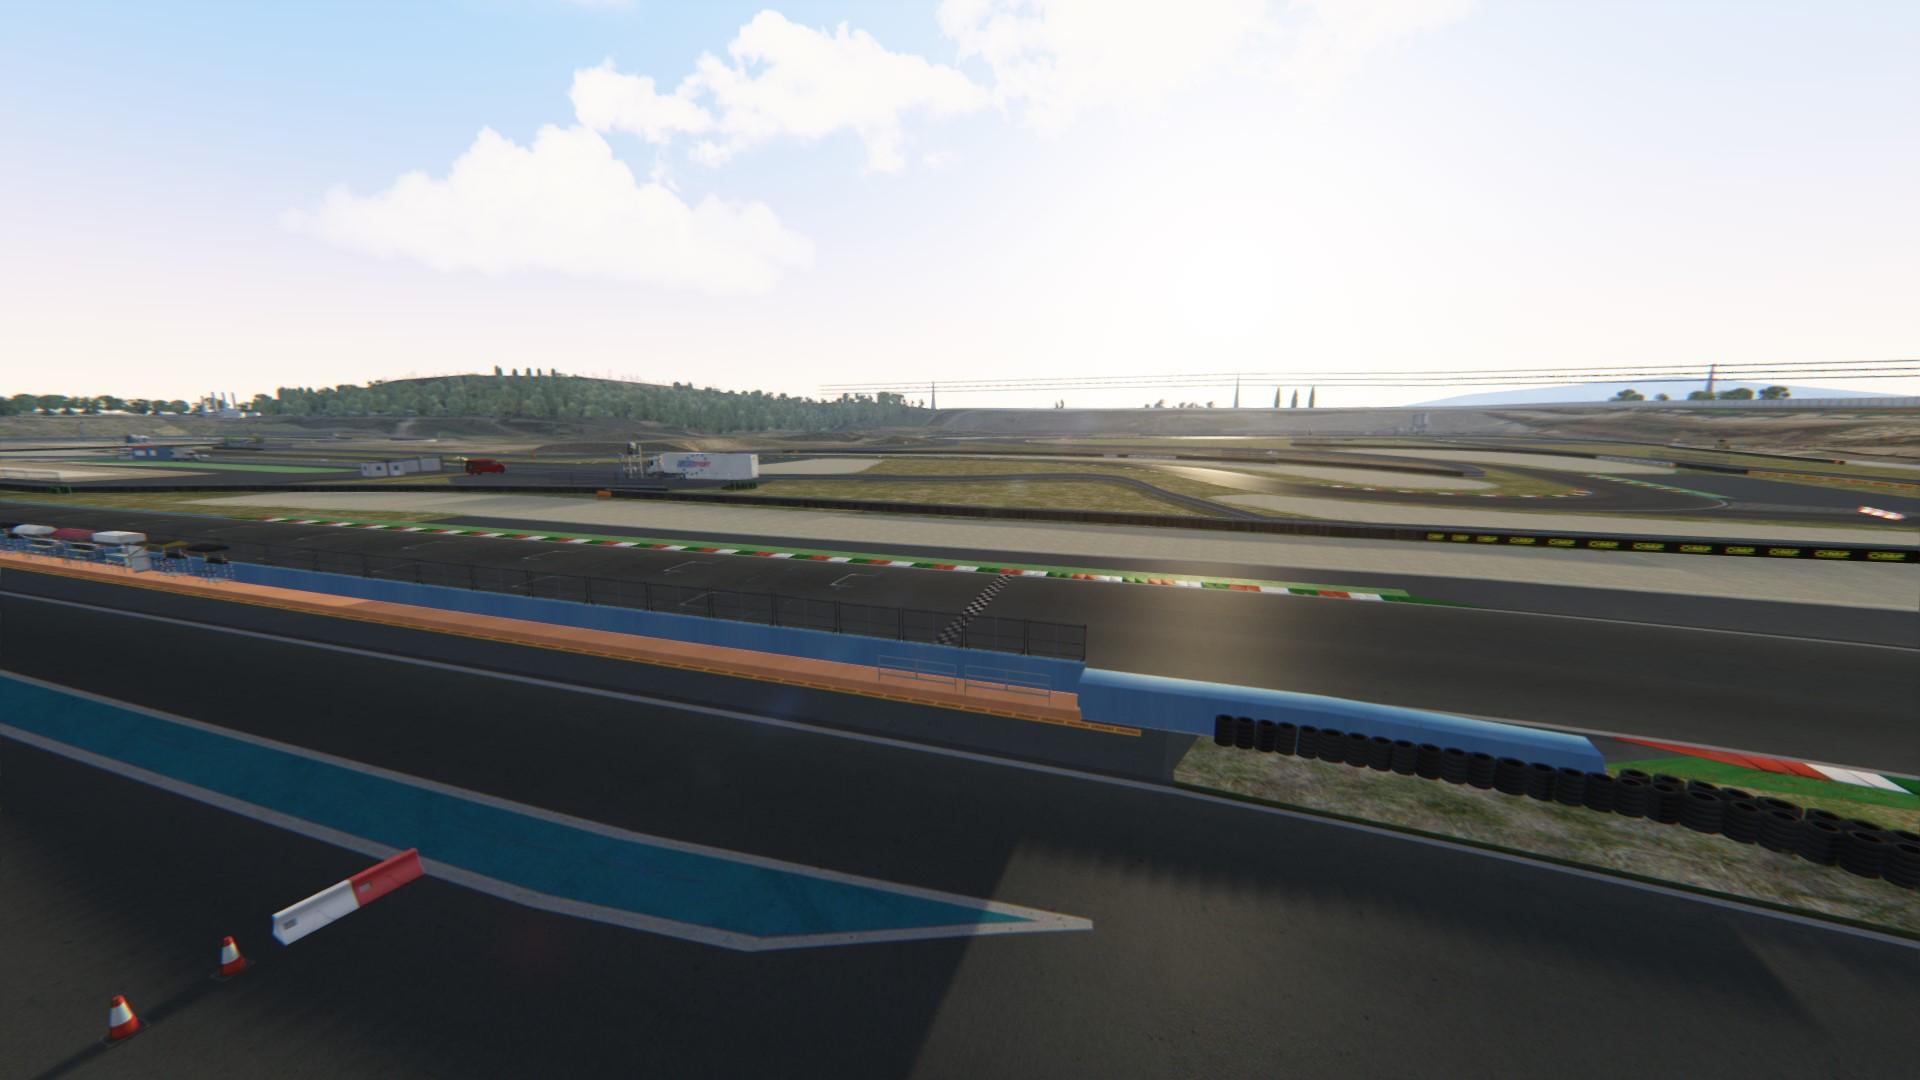 Screenshot_ks_toyota_ae86_autodromo_di_franciacorta_1-6-116-0-36-12.jpg